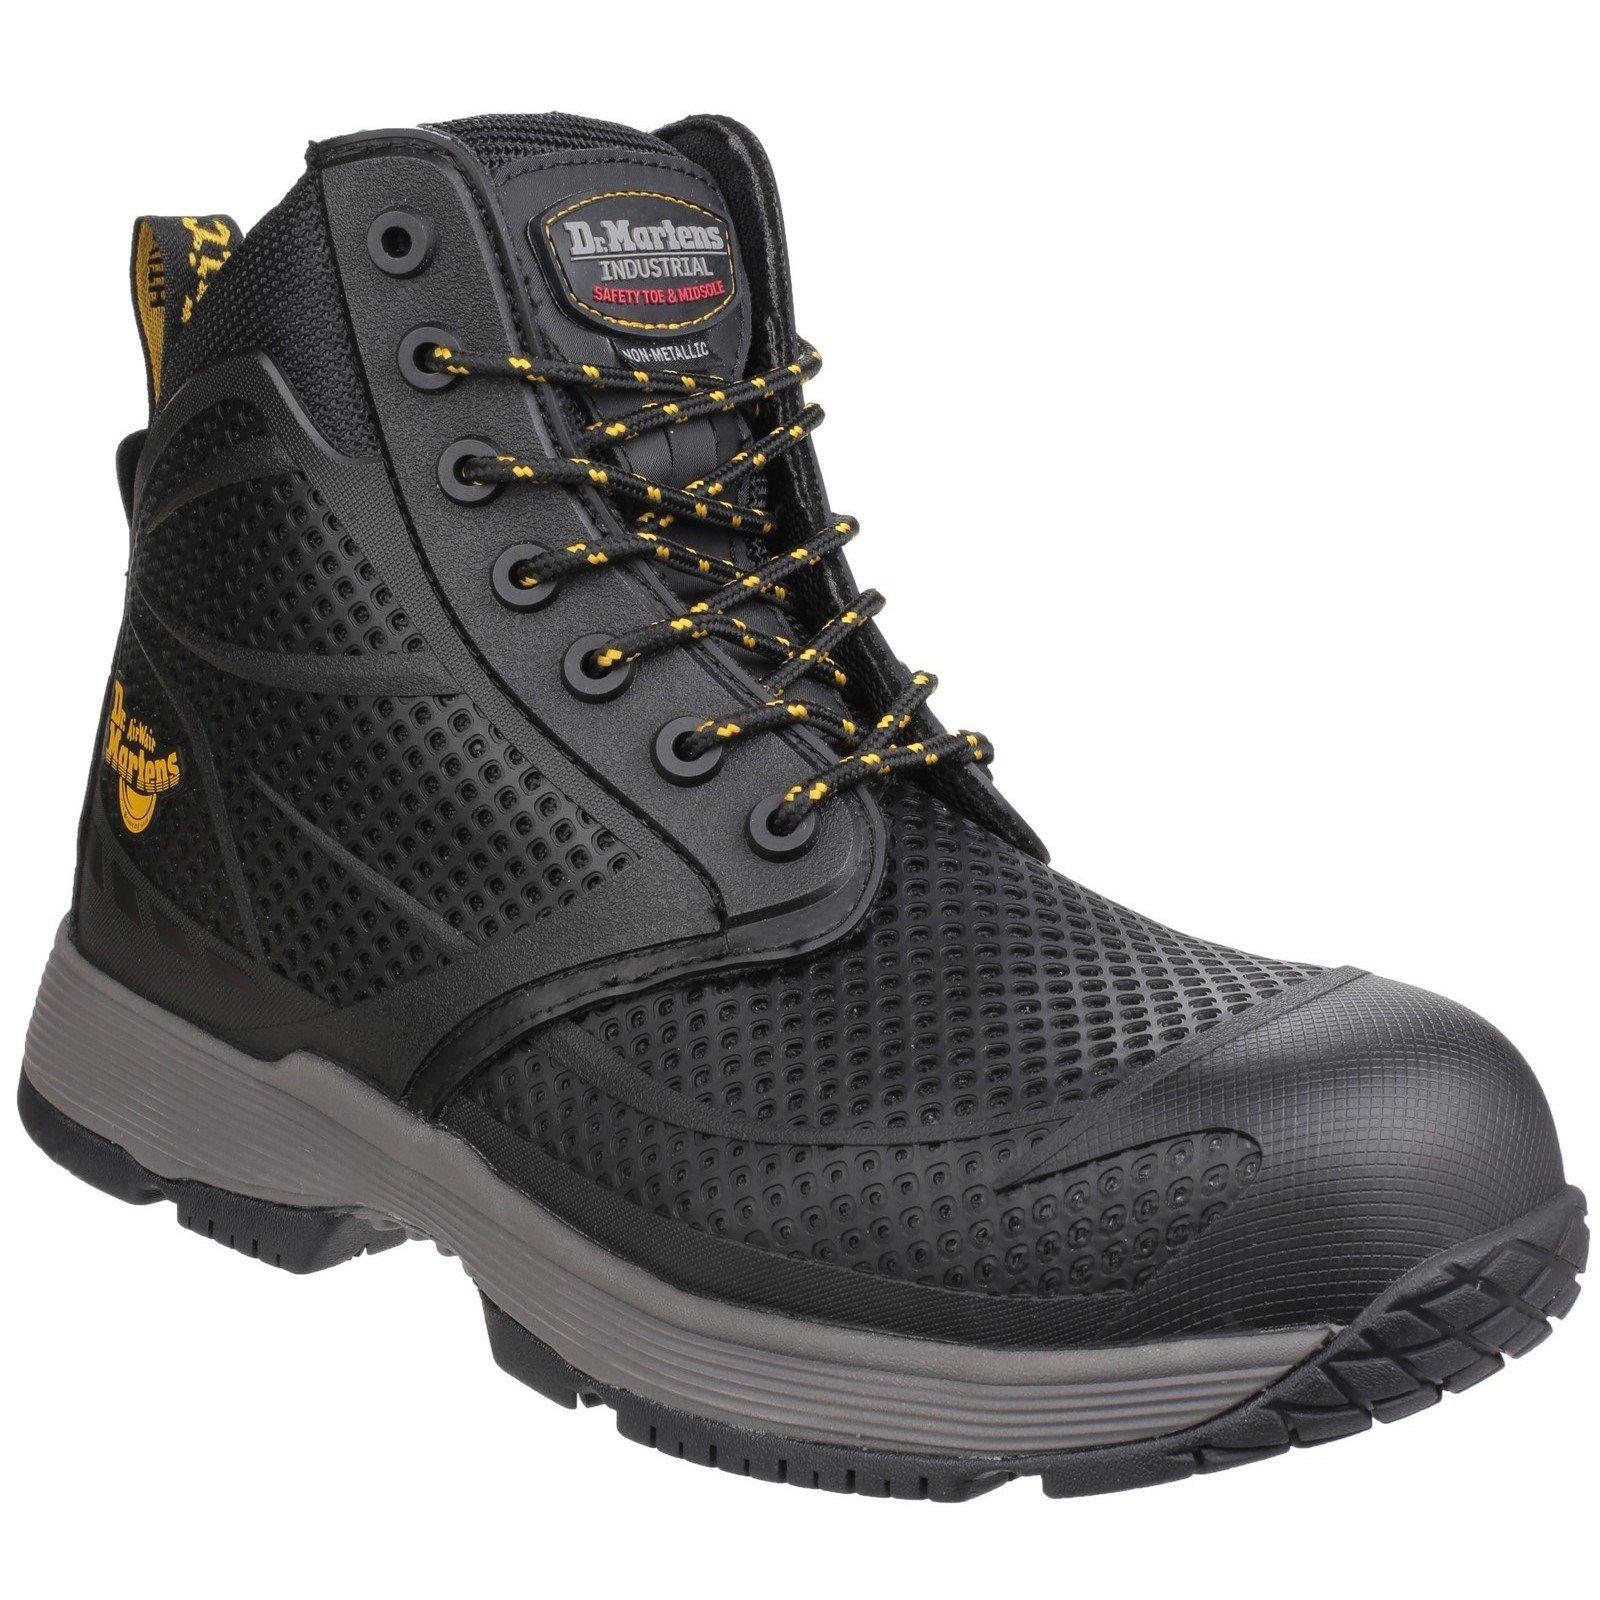 Dr Martens Unisex Calamus Lace up Safety Boot Black 24535-40574 - Black 11